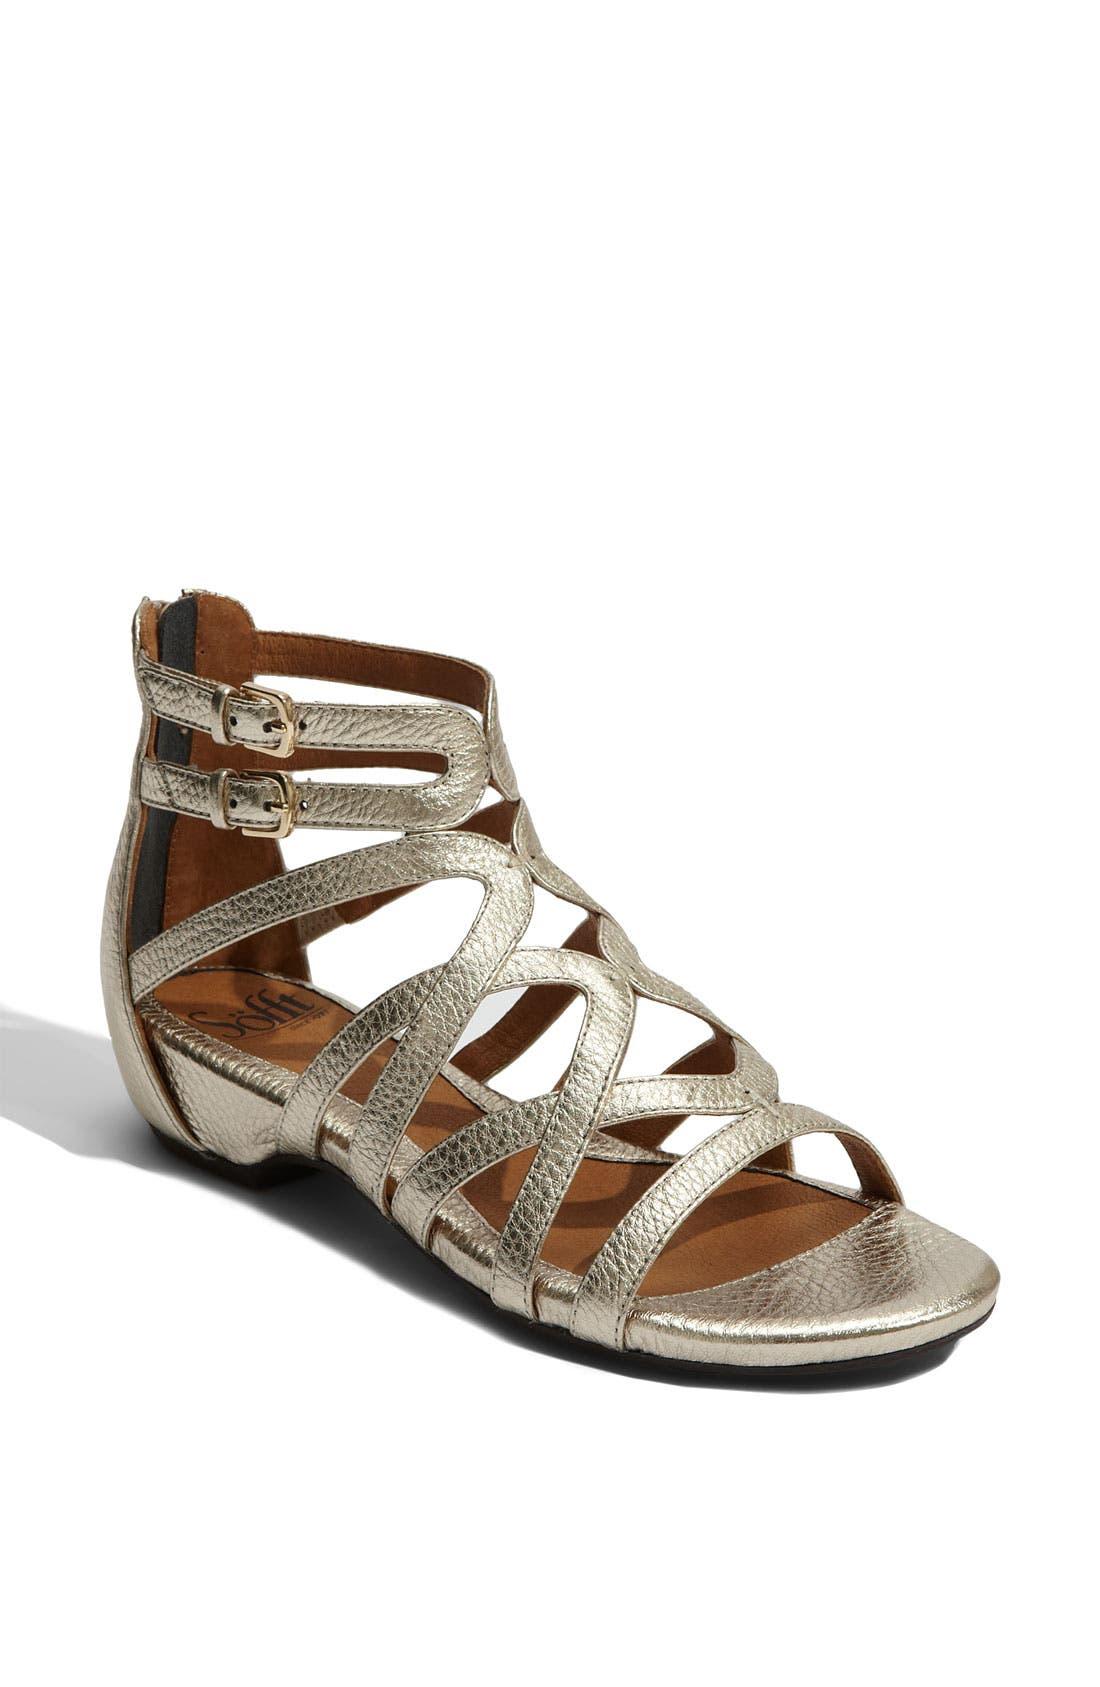 Main Image - Söfft 'Ravenna' Sandal